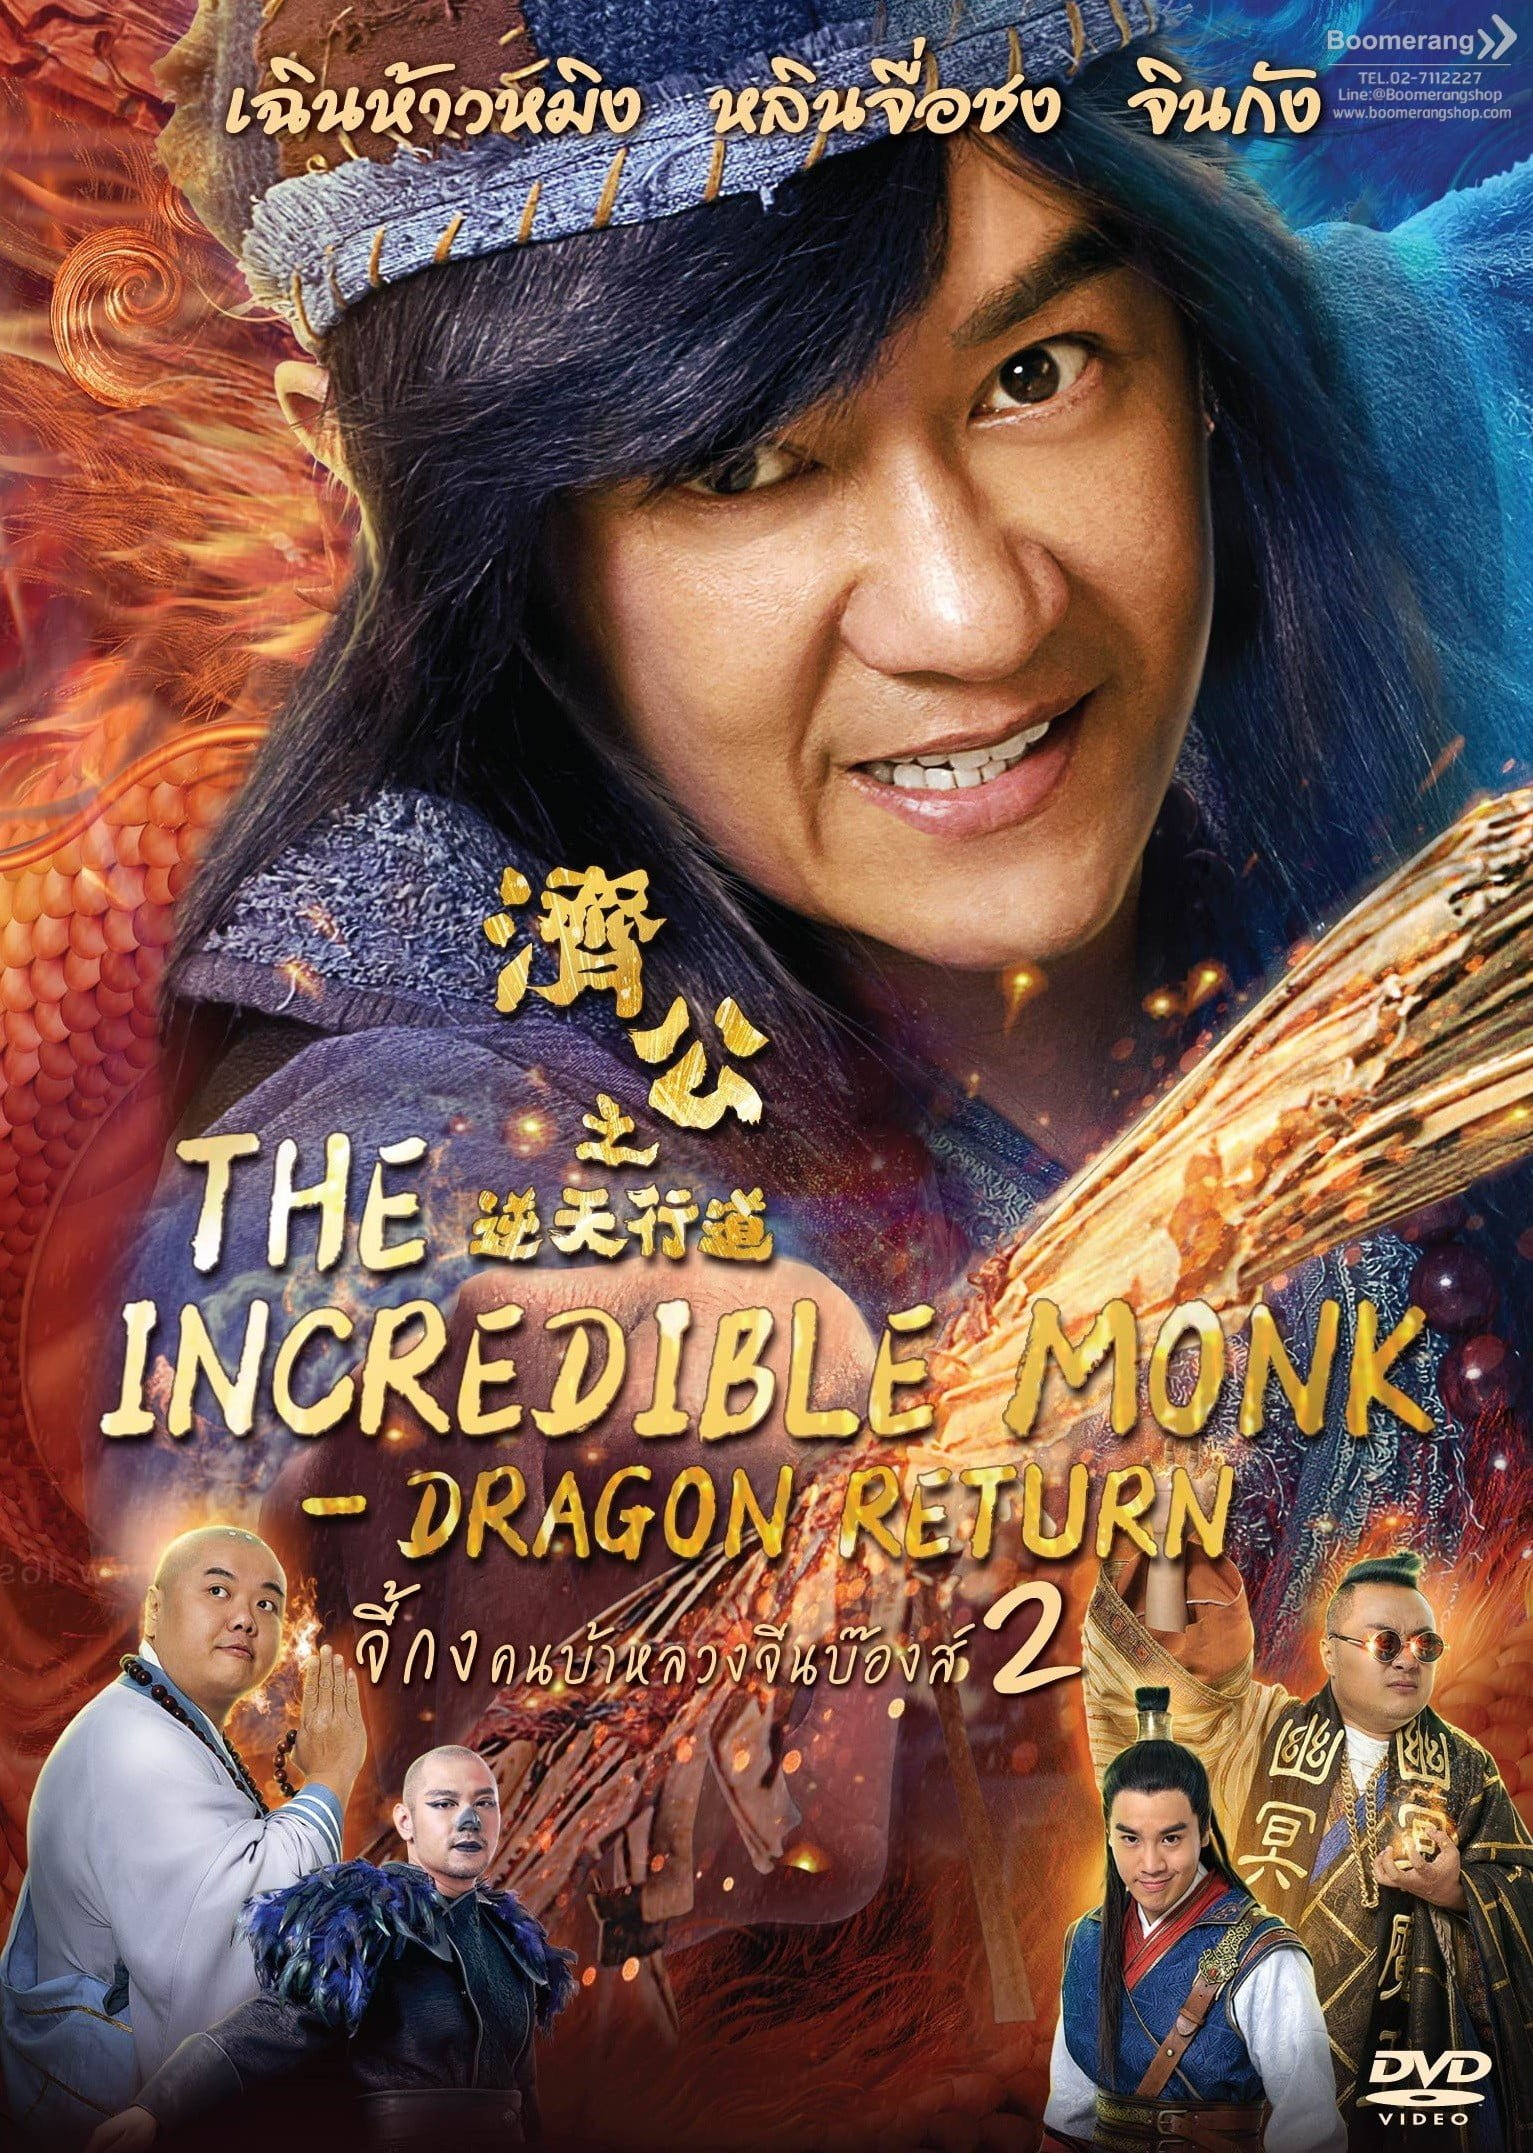 The Incredible Monk Dragon Return (2018)